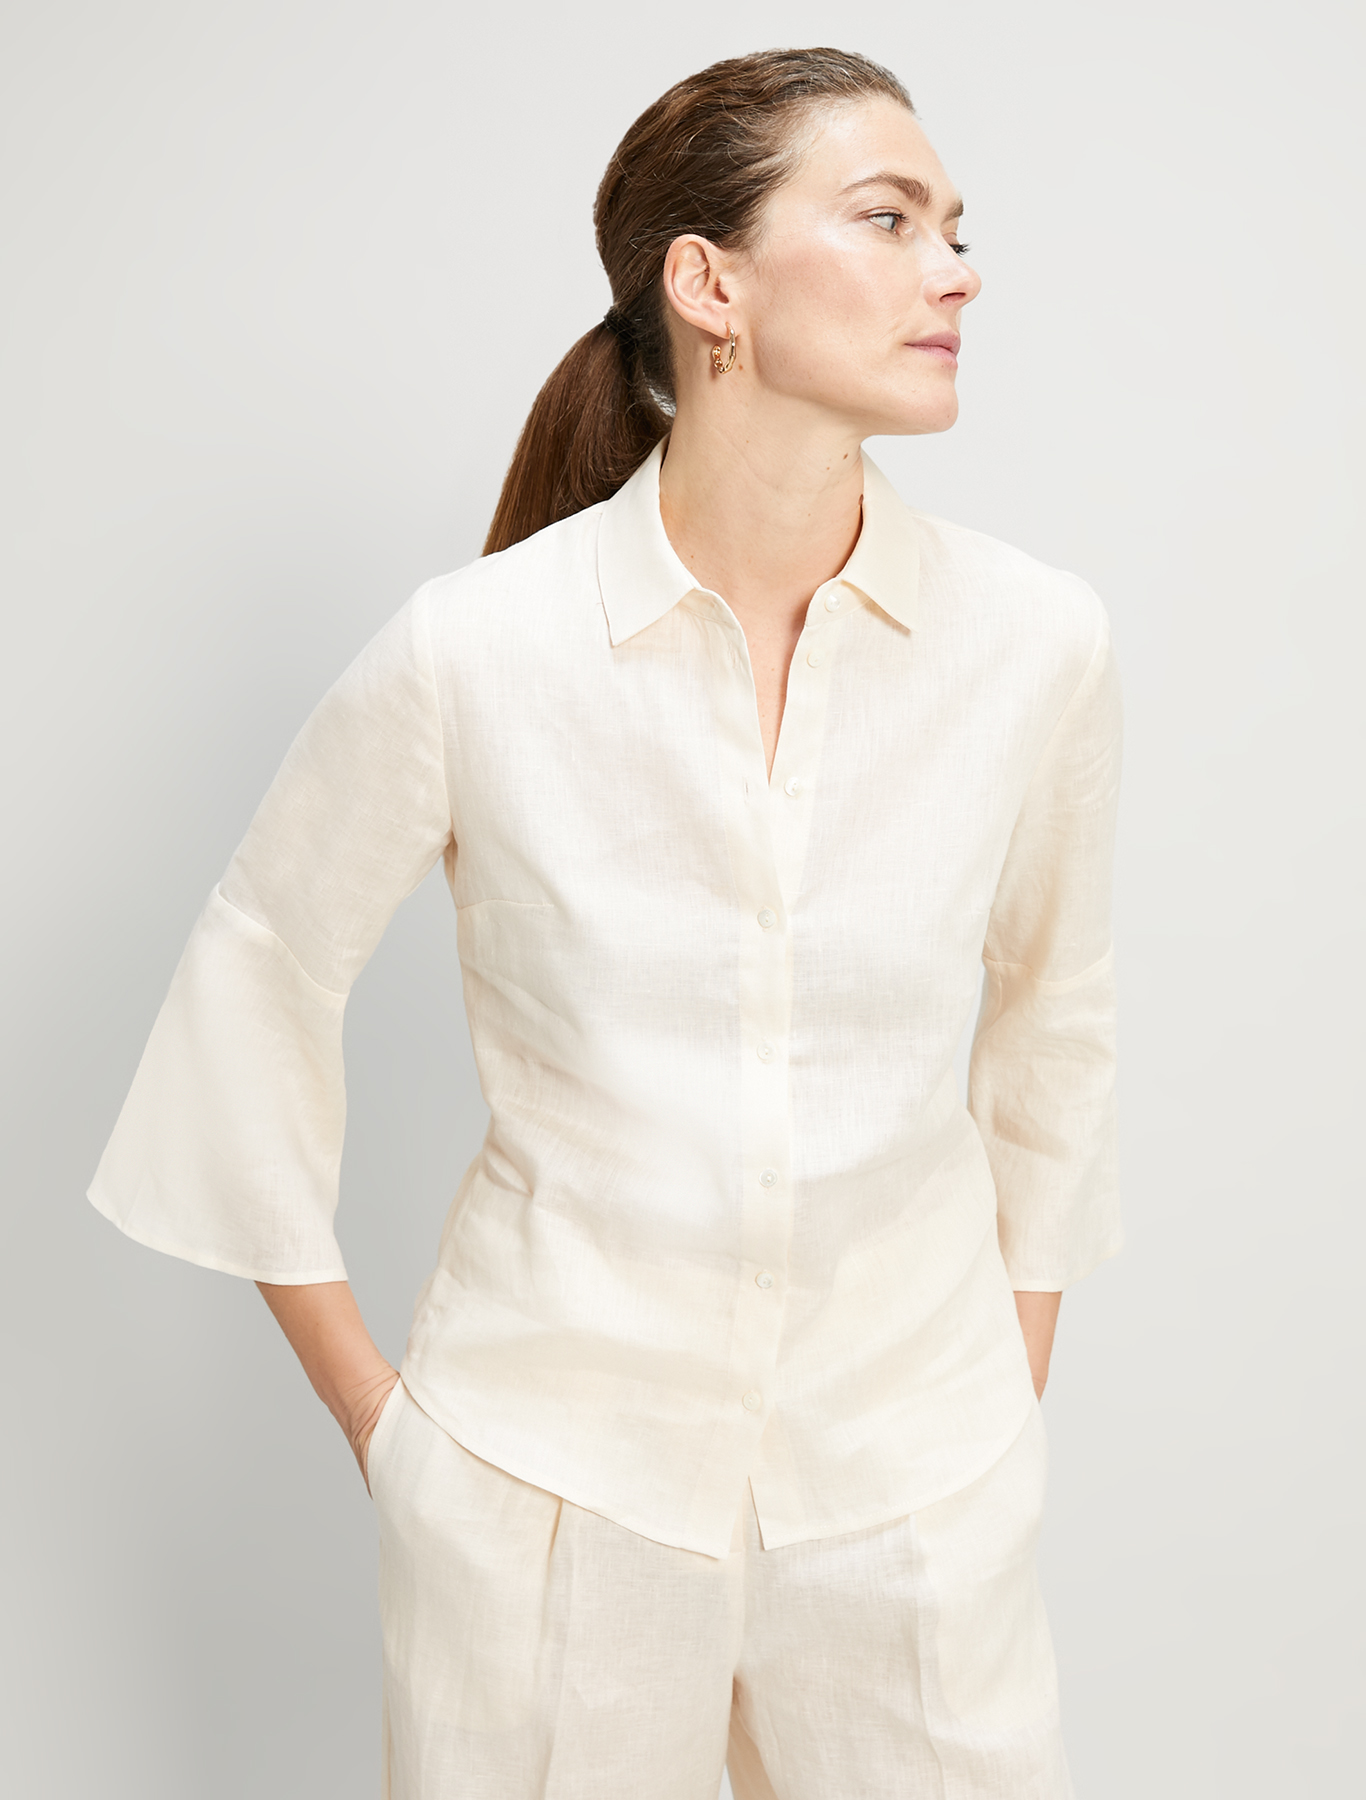 Pure linen shirt - ivory - pennyblack